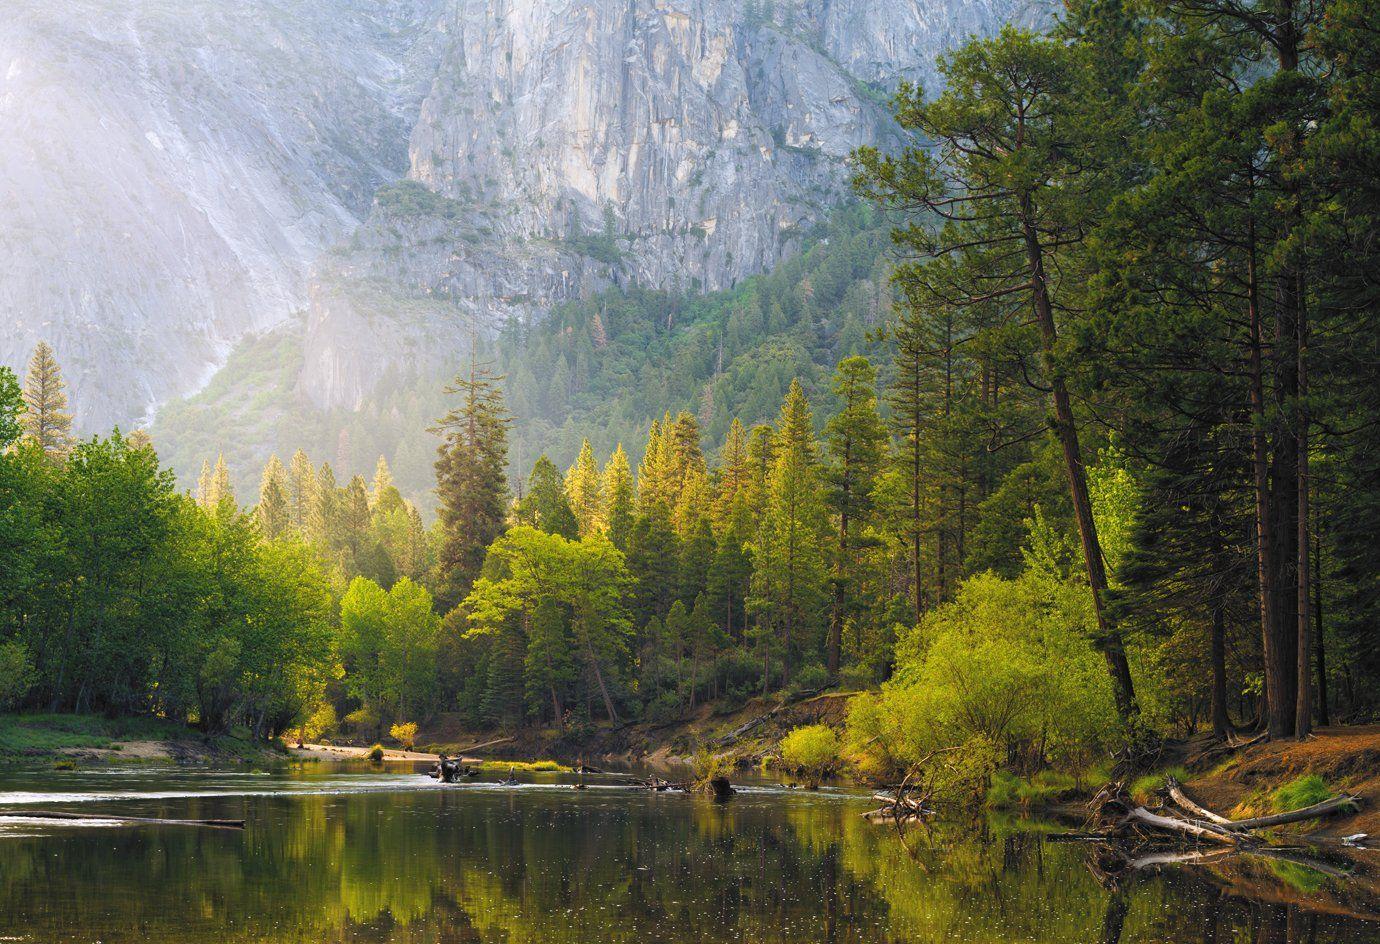 Merced River, Yosemite , Alexander Ravin (www.worldwidephoto.ru)